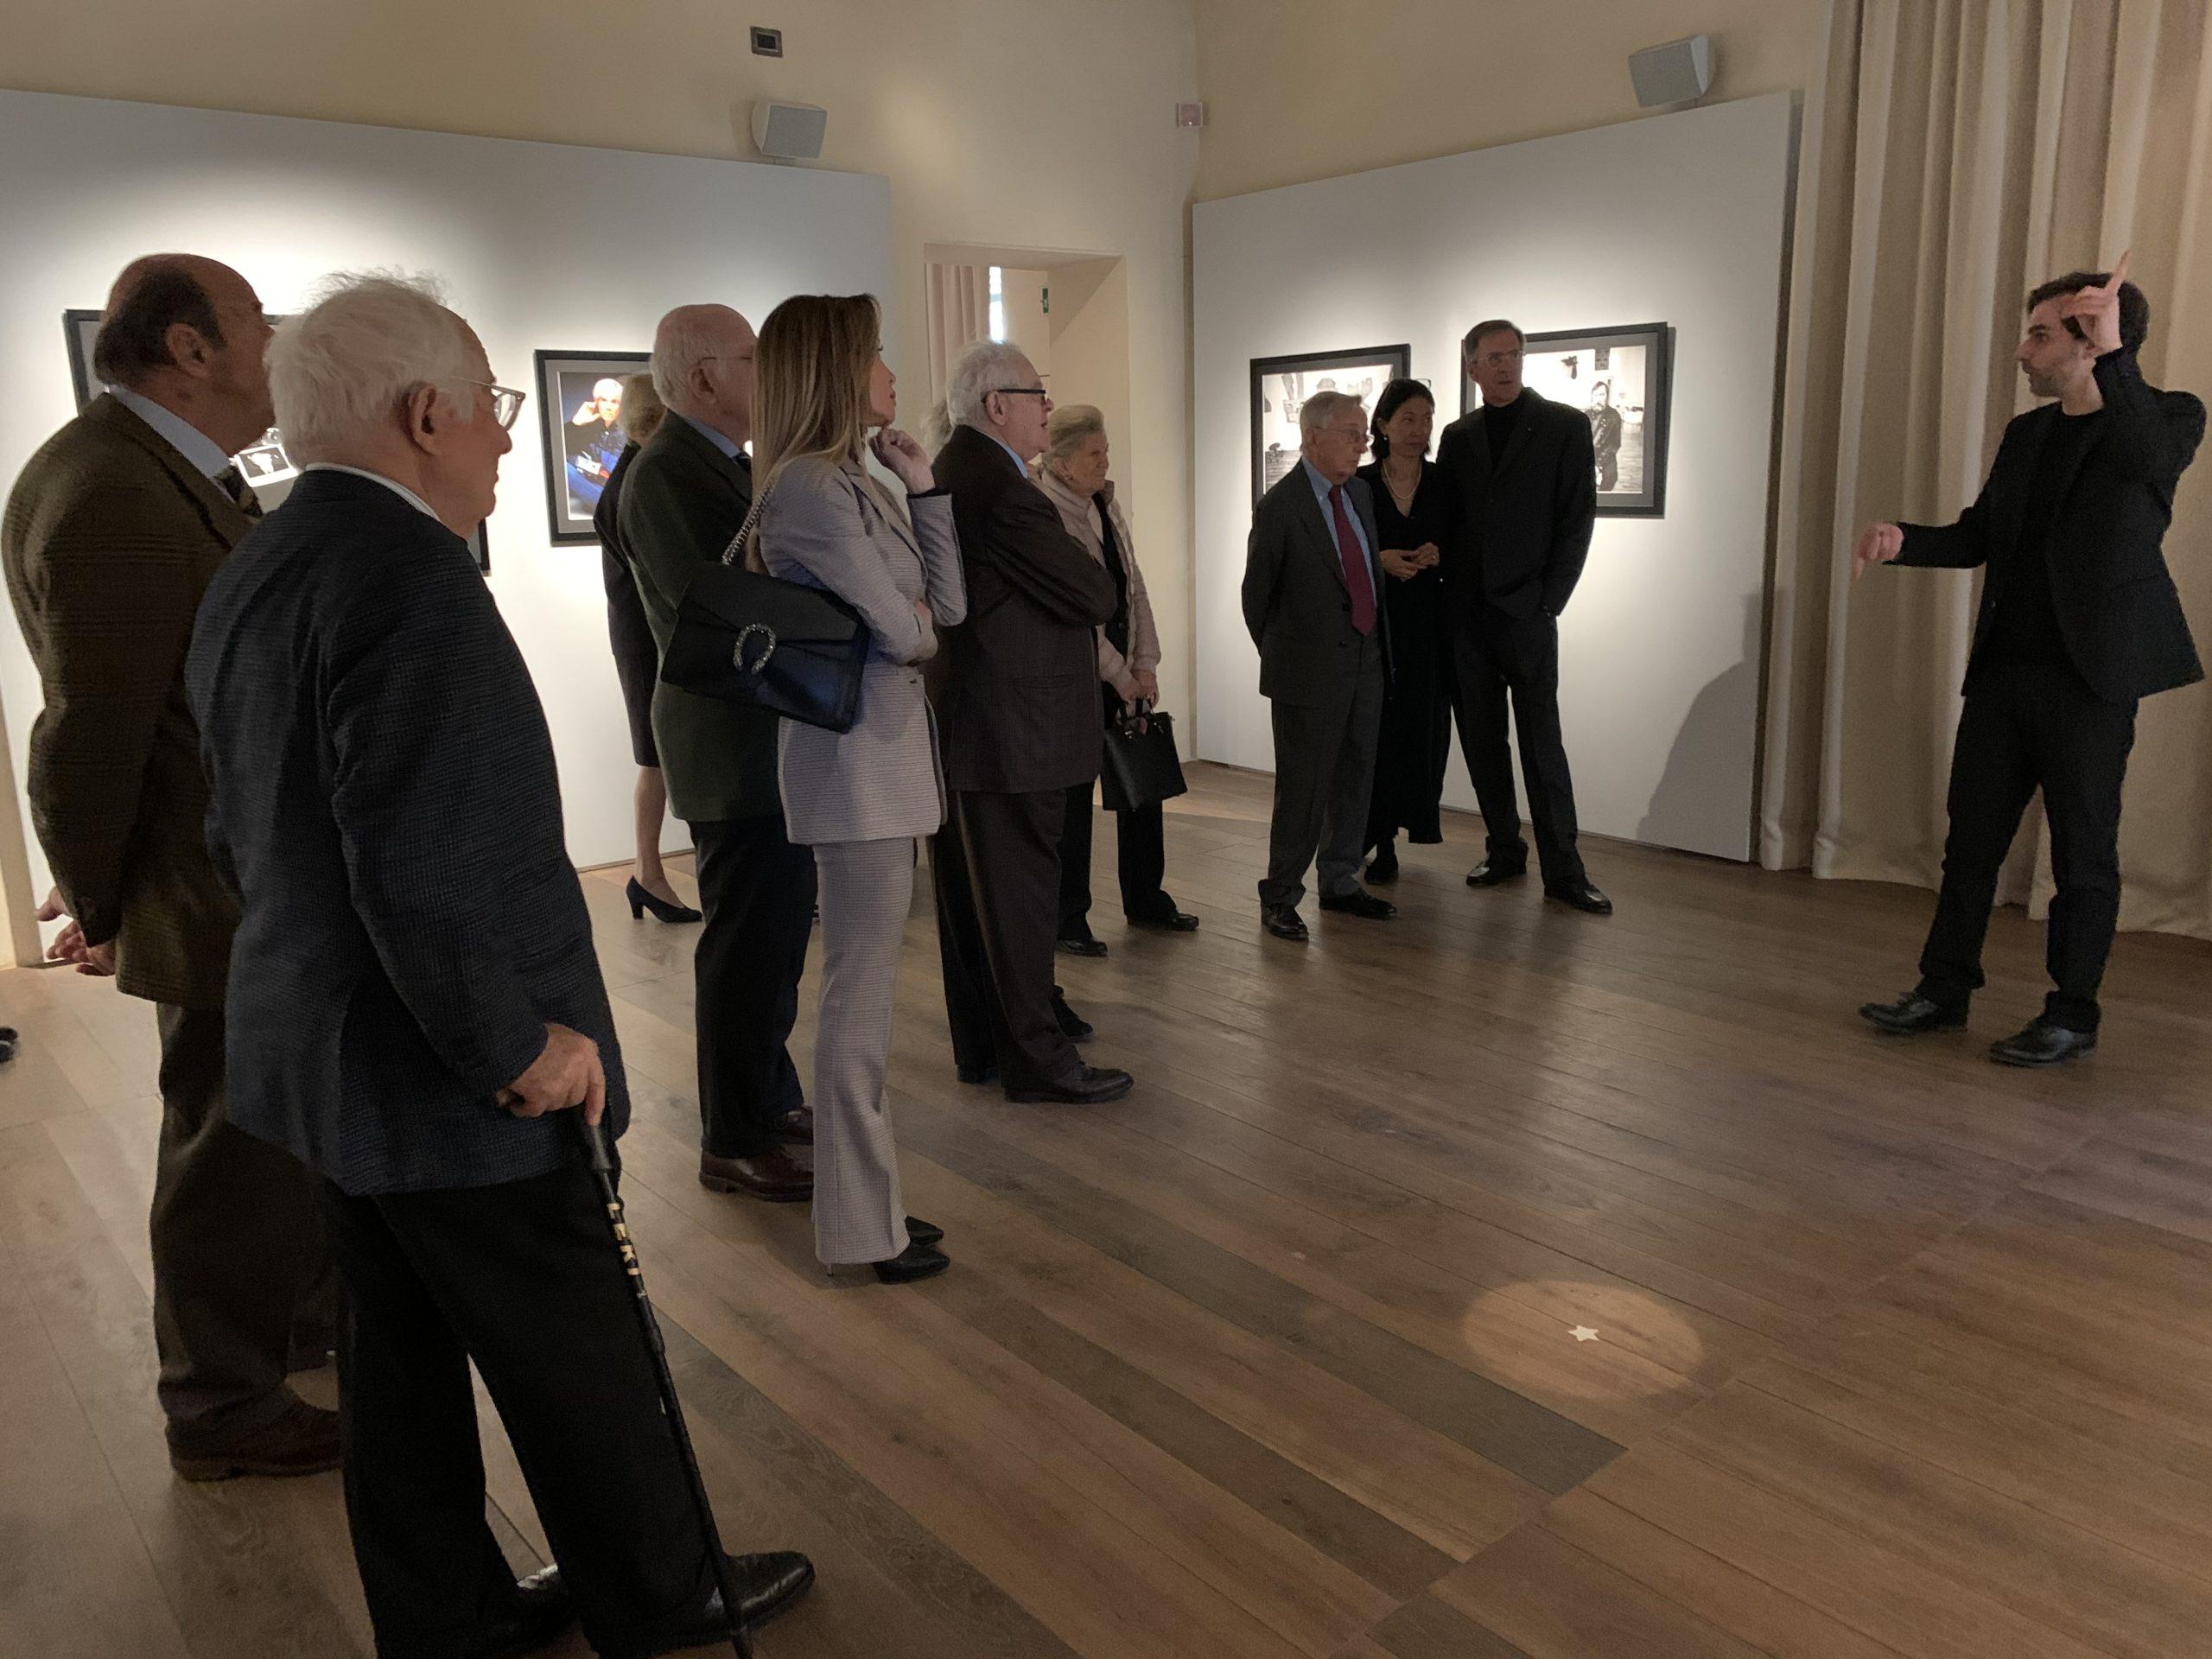 Visita dei Cavalieri del Lavoro Piemontesi alla mostra